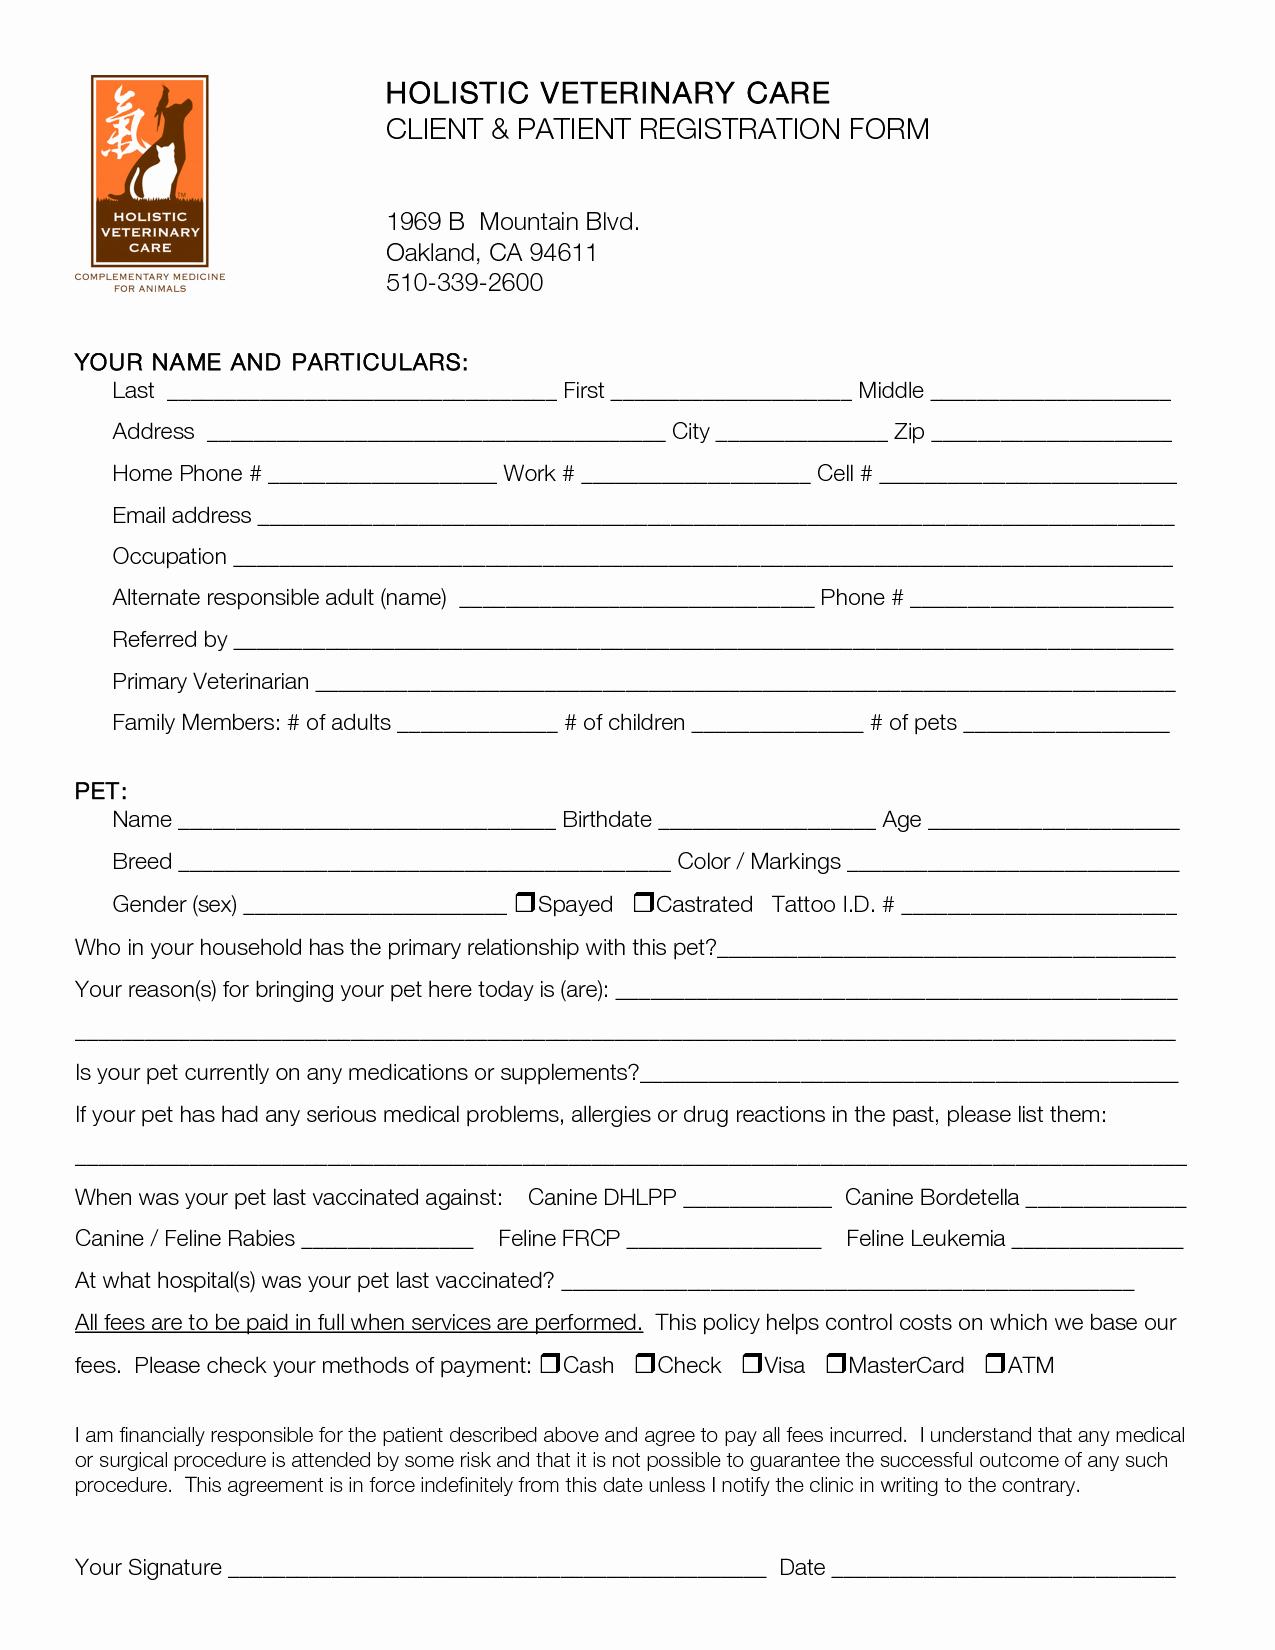 Dental Patient Registration form Template Inspirational Best S Of Printable Patient Registration forms